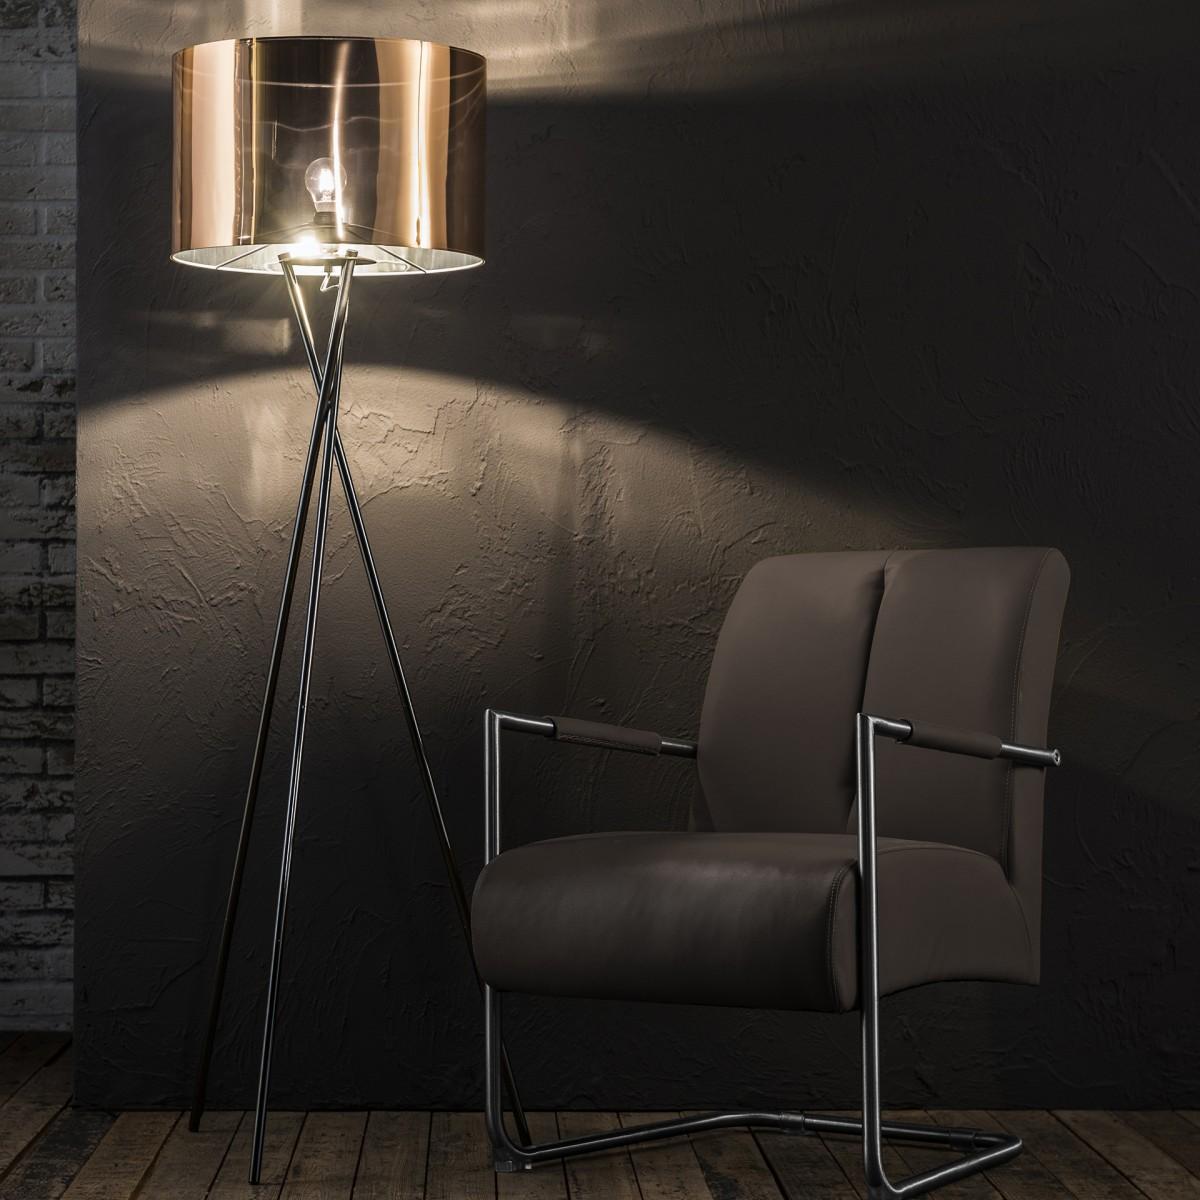 stehlampe silber kupfer stehleuchte mit lampenschirm. Black Bedroom Furniture Sets. Home Design Ideas